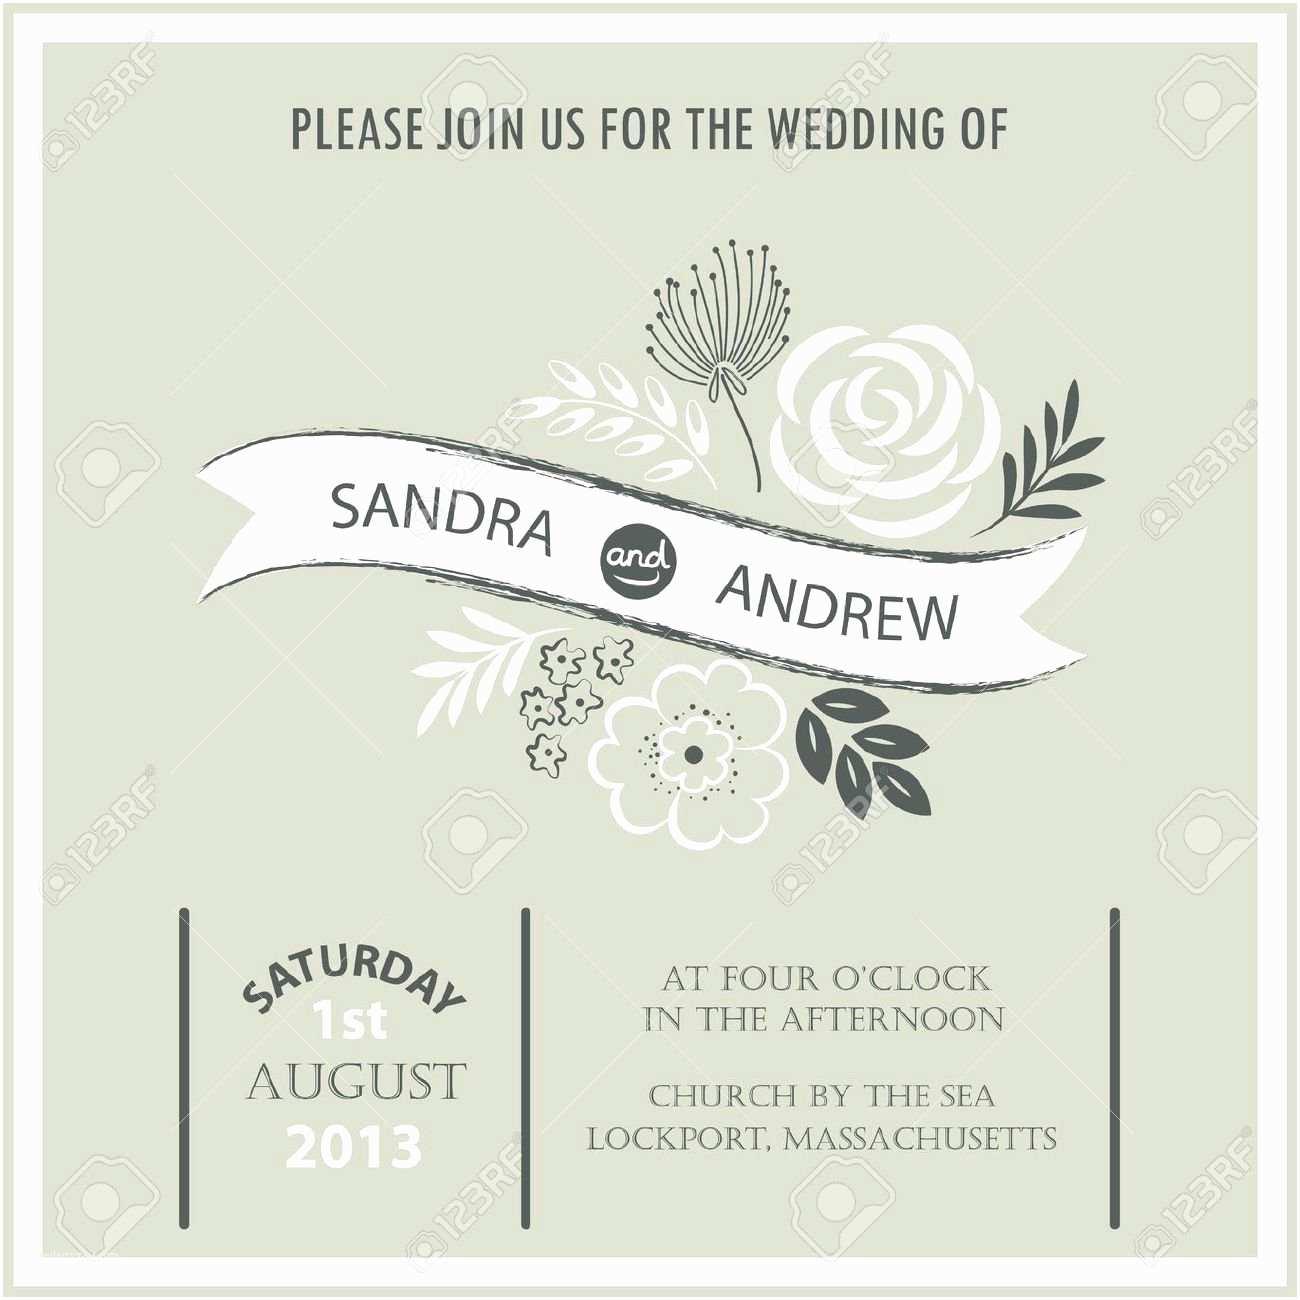 Wedding Invitation Content Marriage Invitation  Wedding Invitation